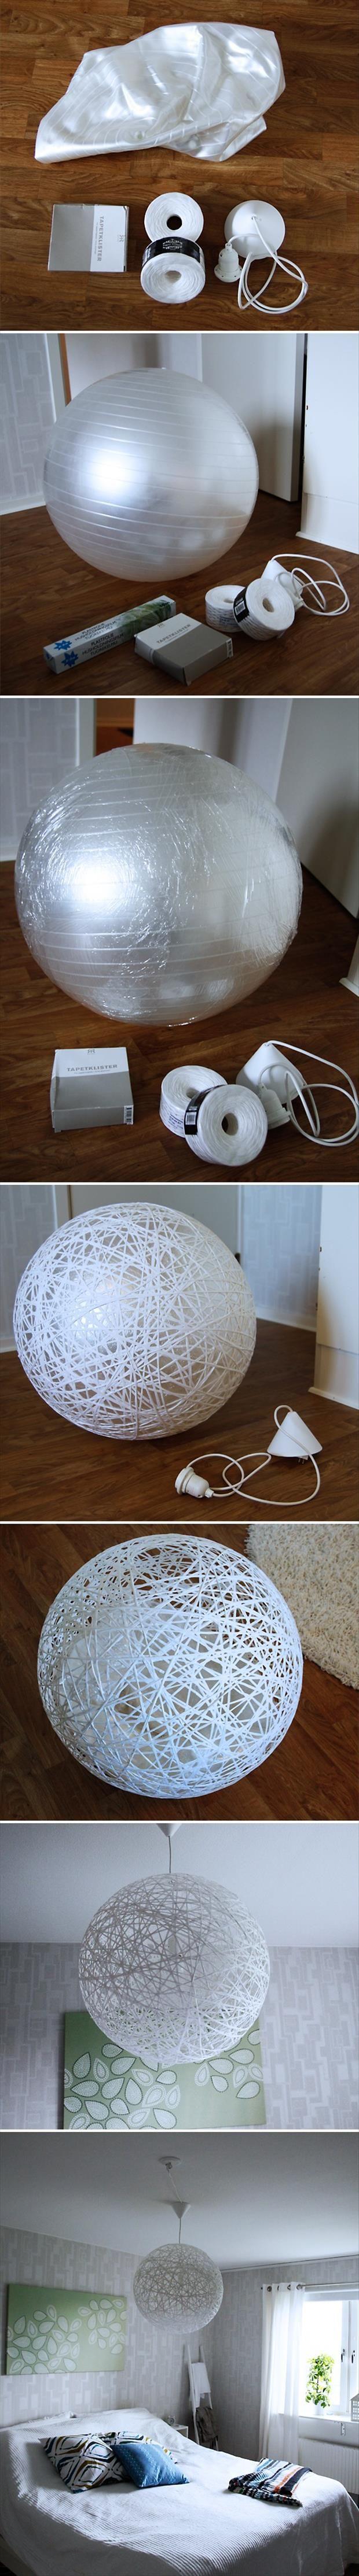 do it yourself lighting ideas. DIY String Lamp Diy Crafts Craft Ideas Easy Home Decor Decorations Lighting Decorating Do It Yourself